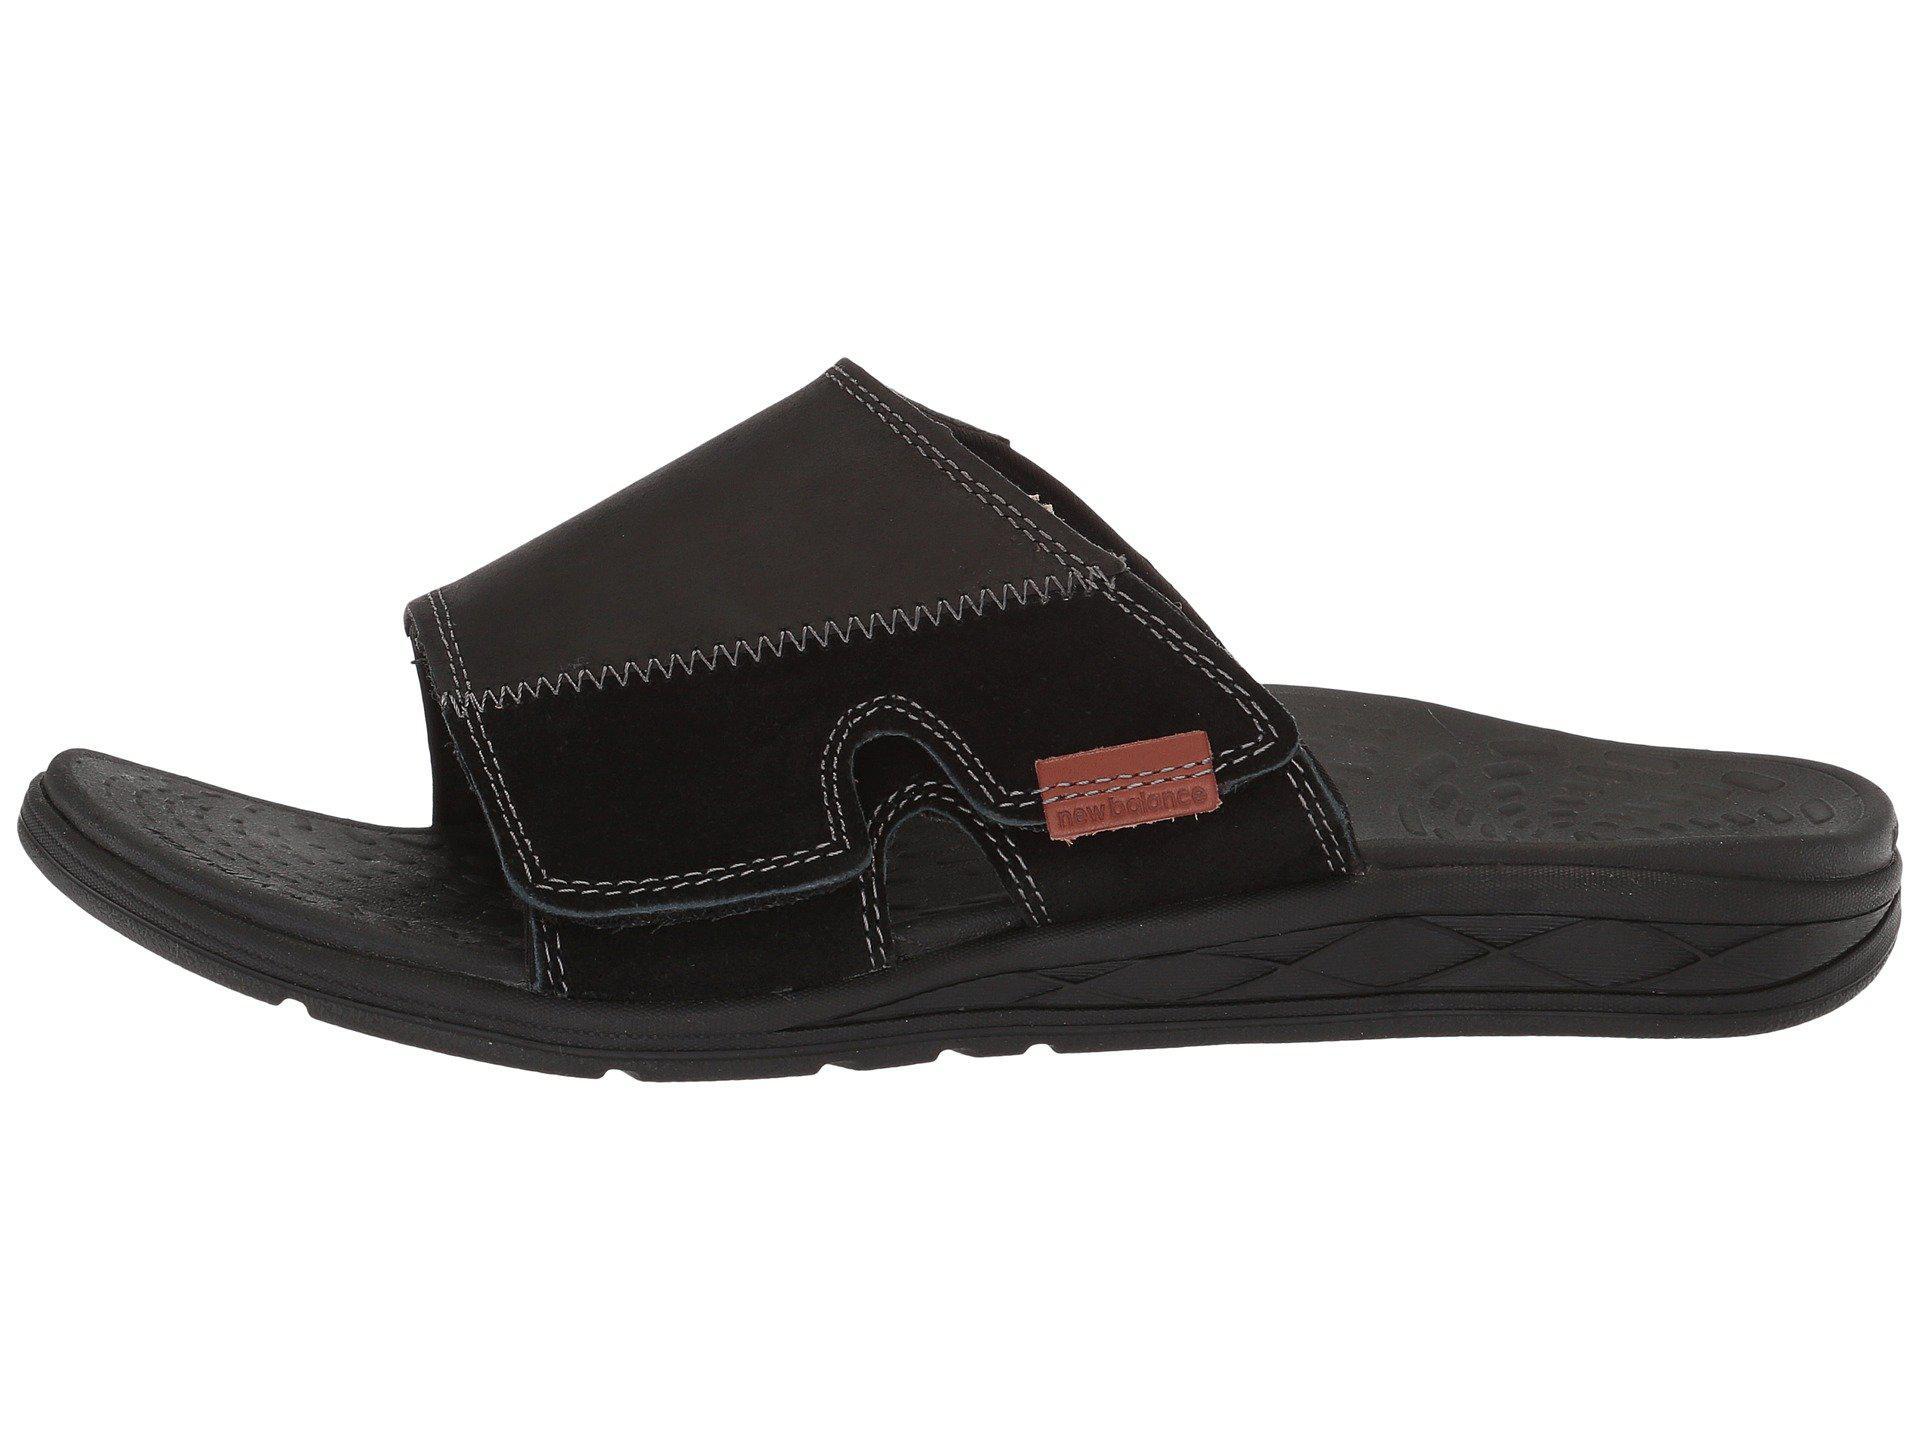 New Balance Leather Quest Slide Sandal